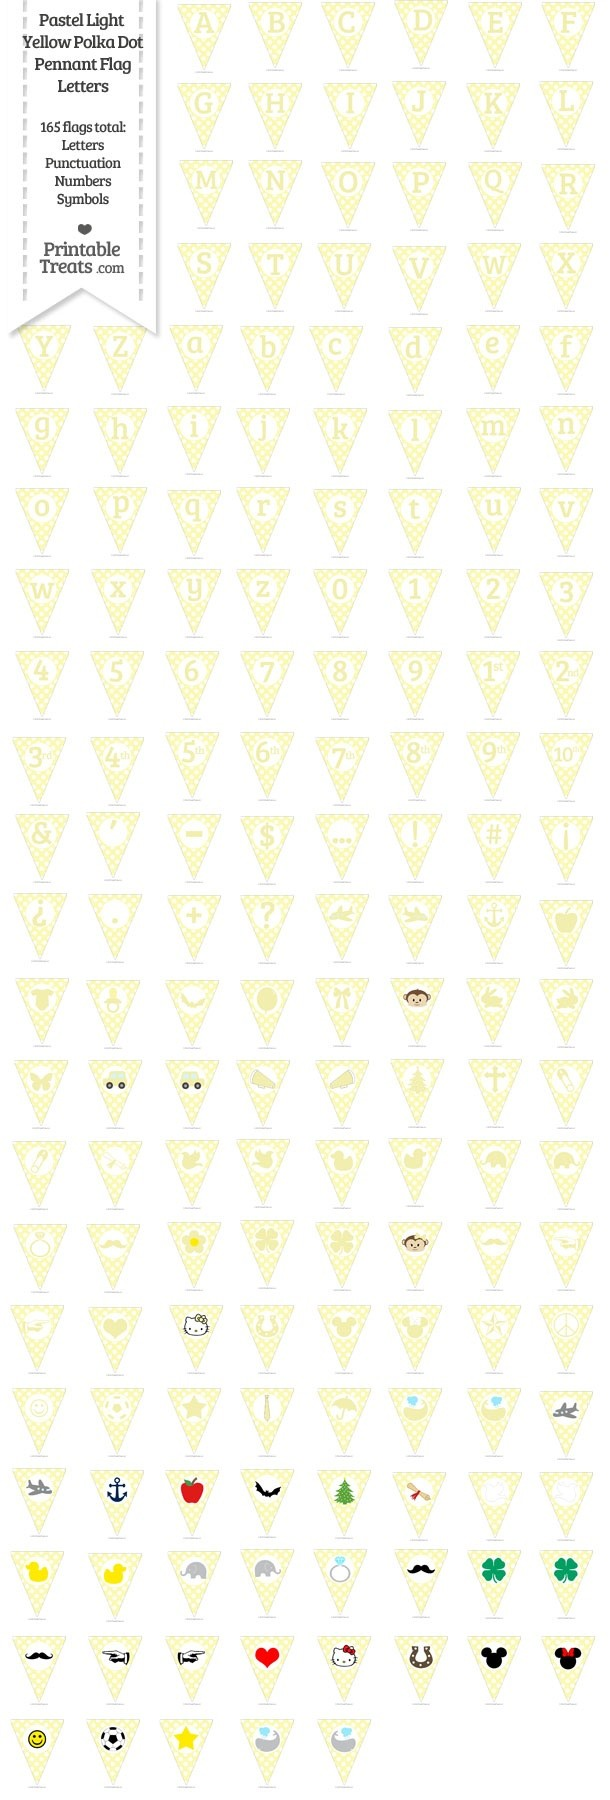 165 Pastel Light Yellow Polka Dot Pennant Flag Letters Password